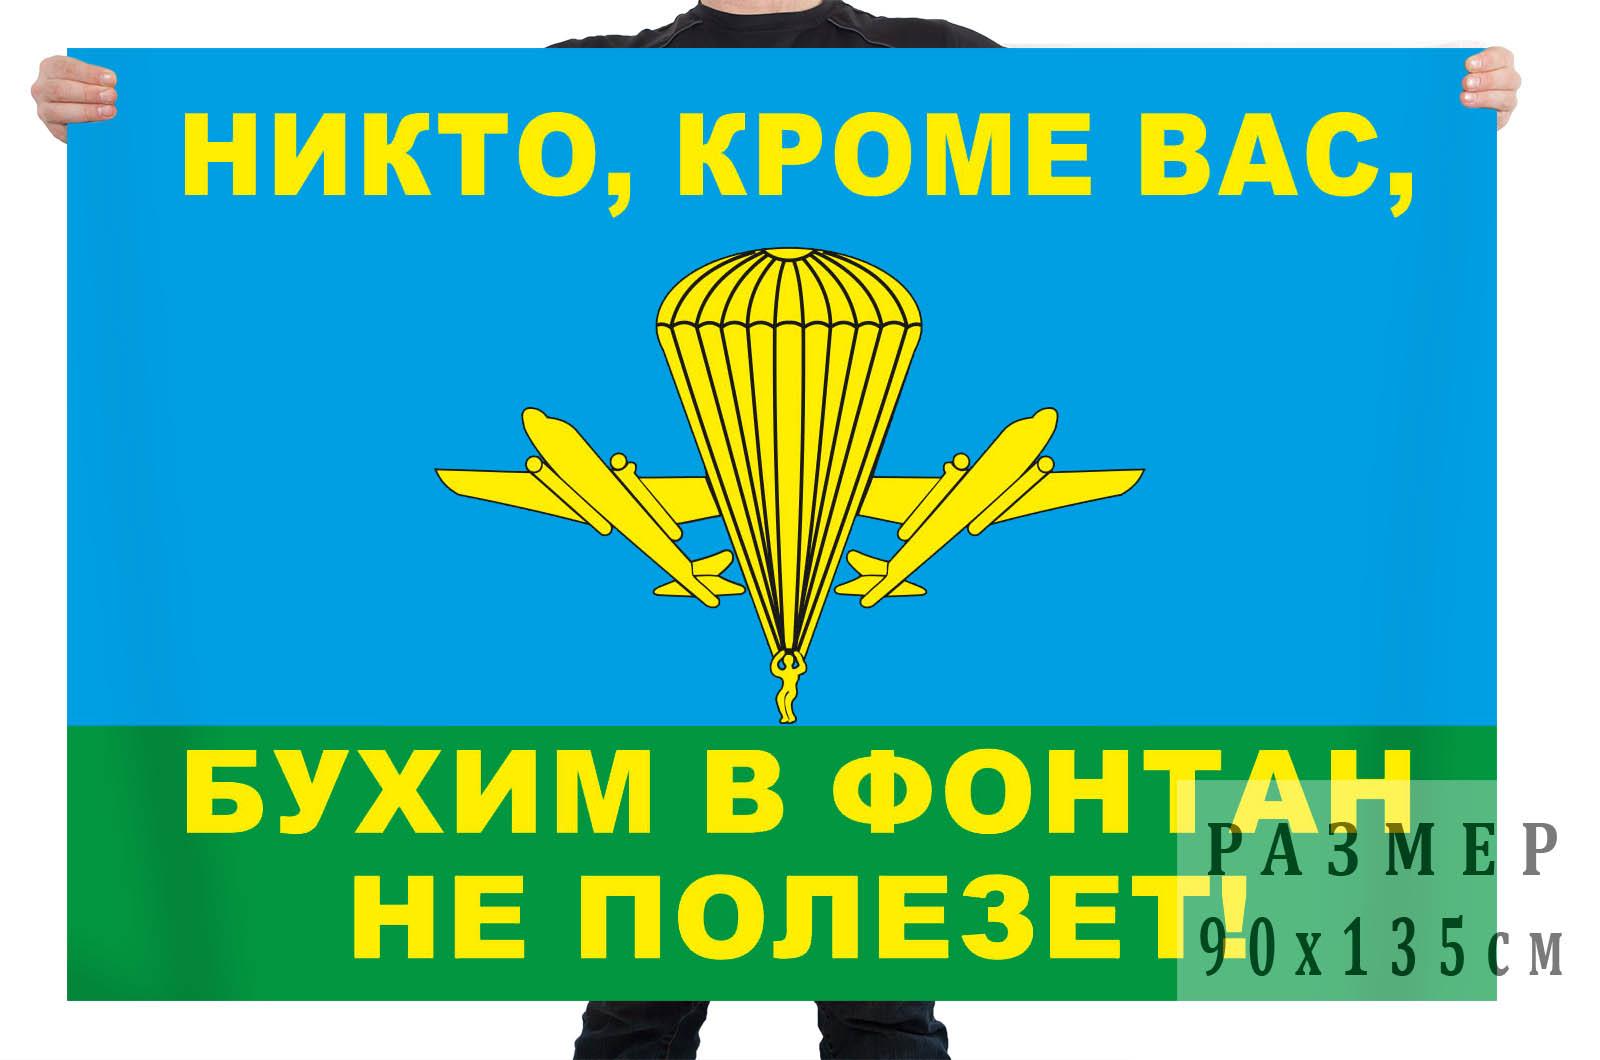 Флаг ВДВ с шутливым лозунгом